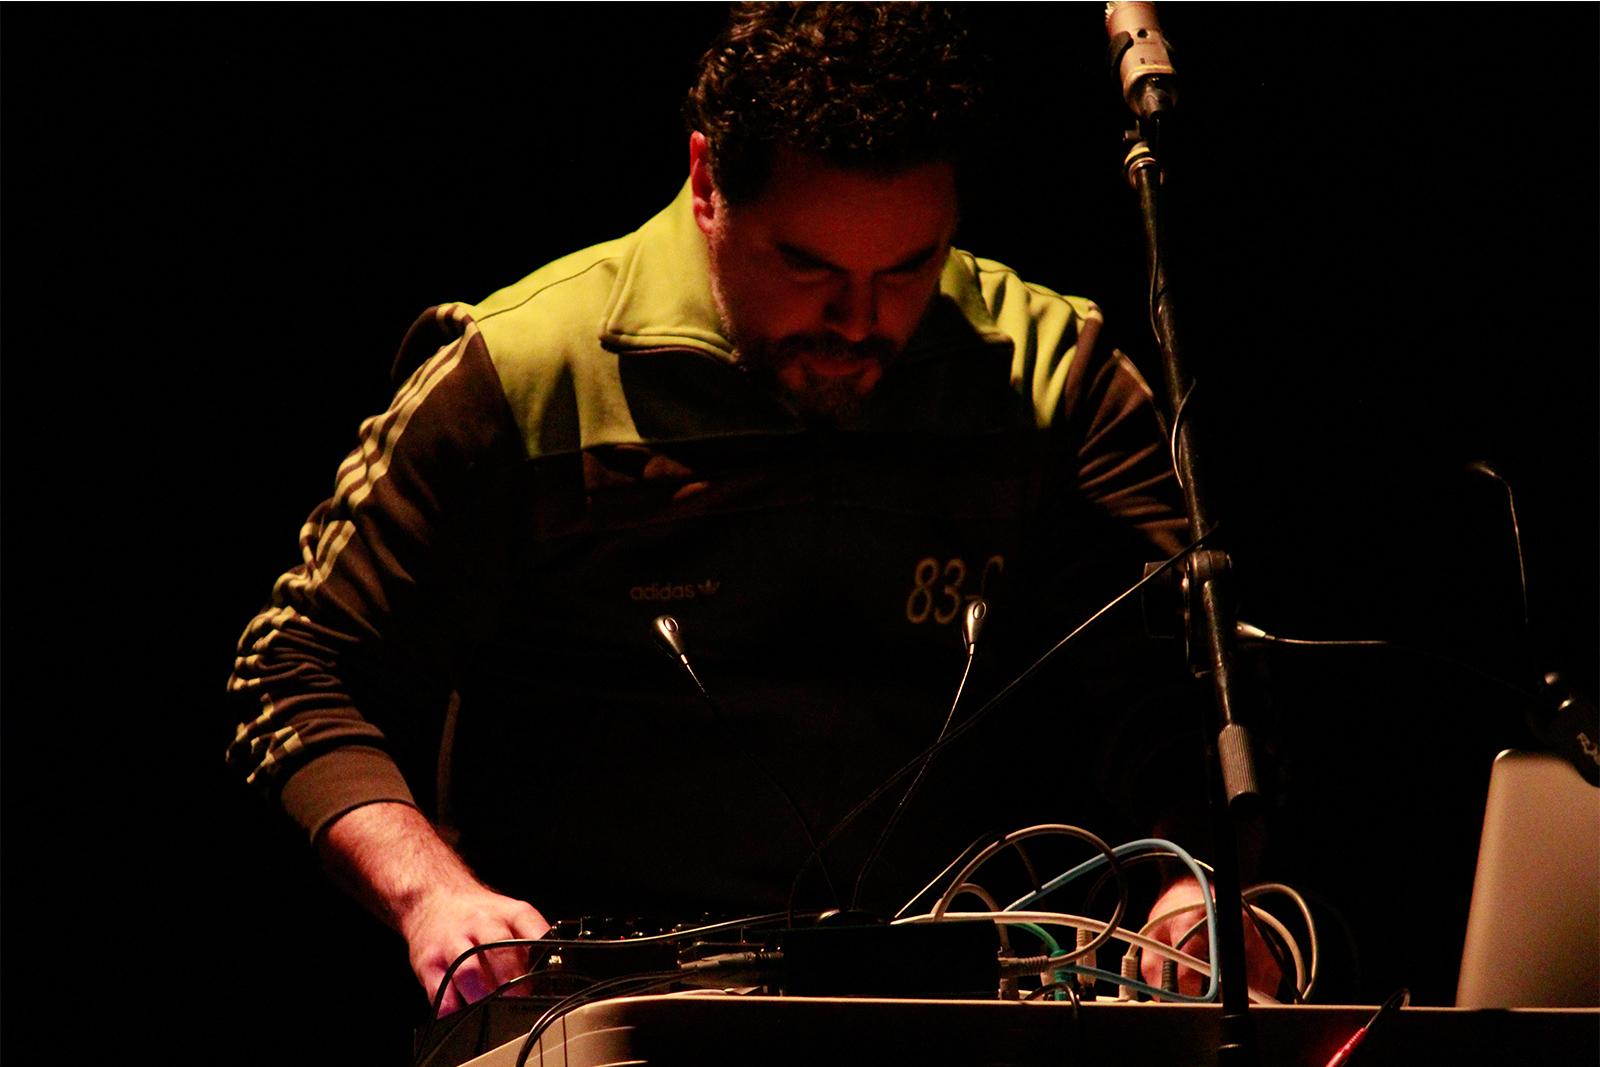 Carlos Iturralde. Velocidade II